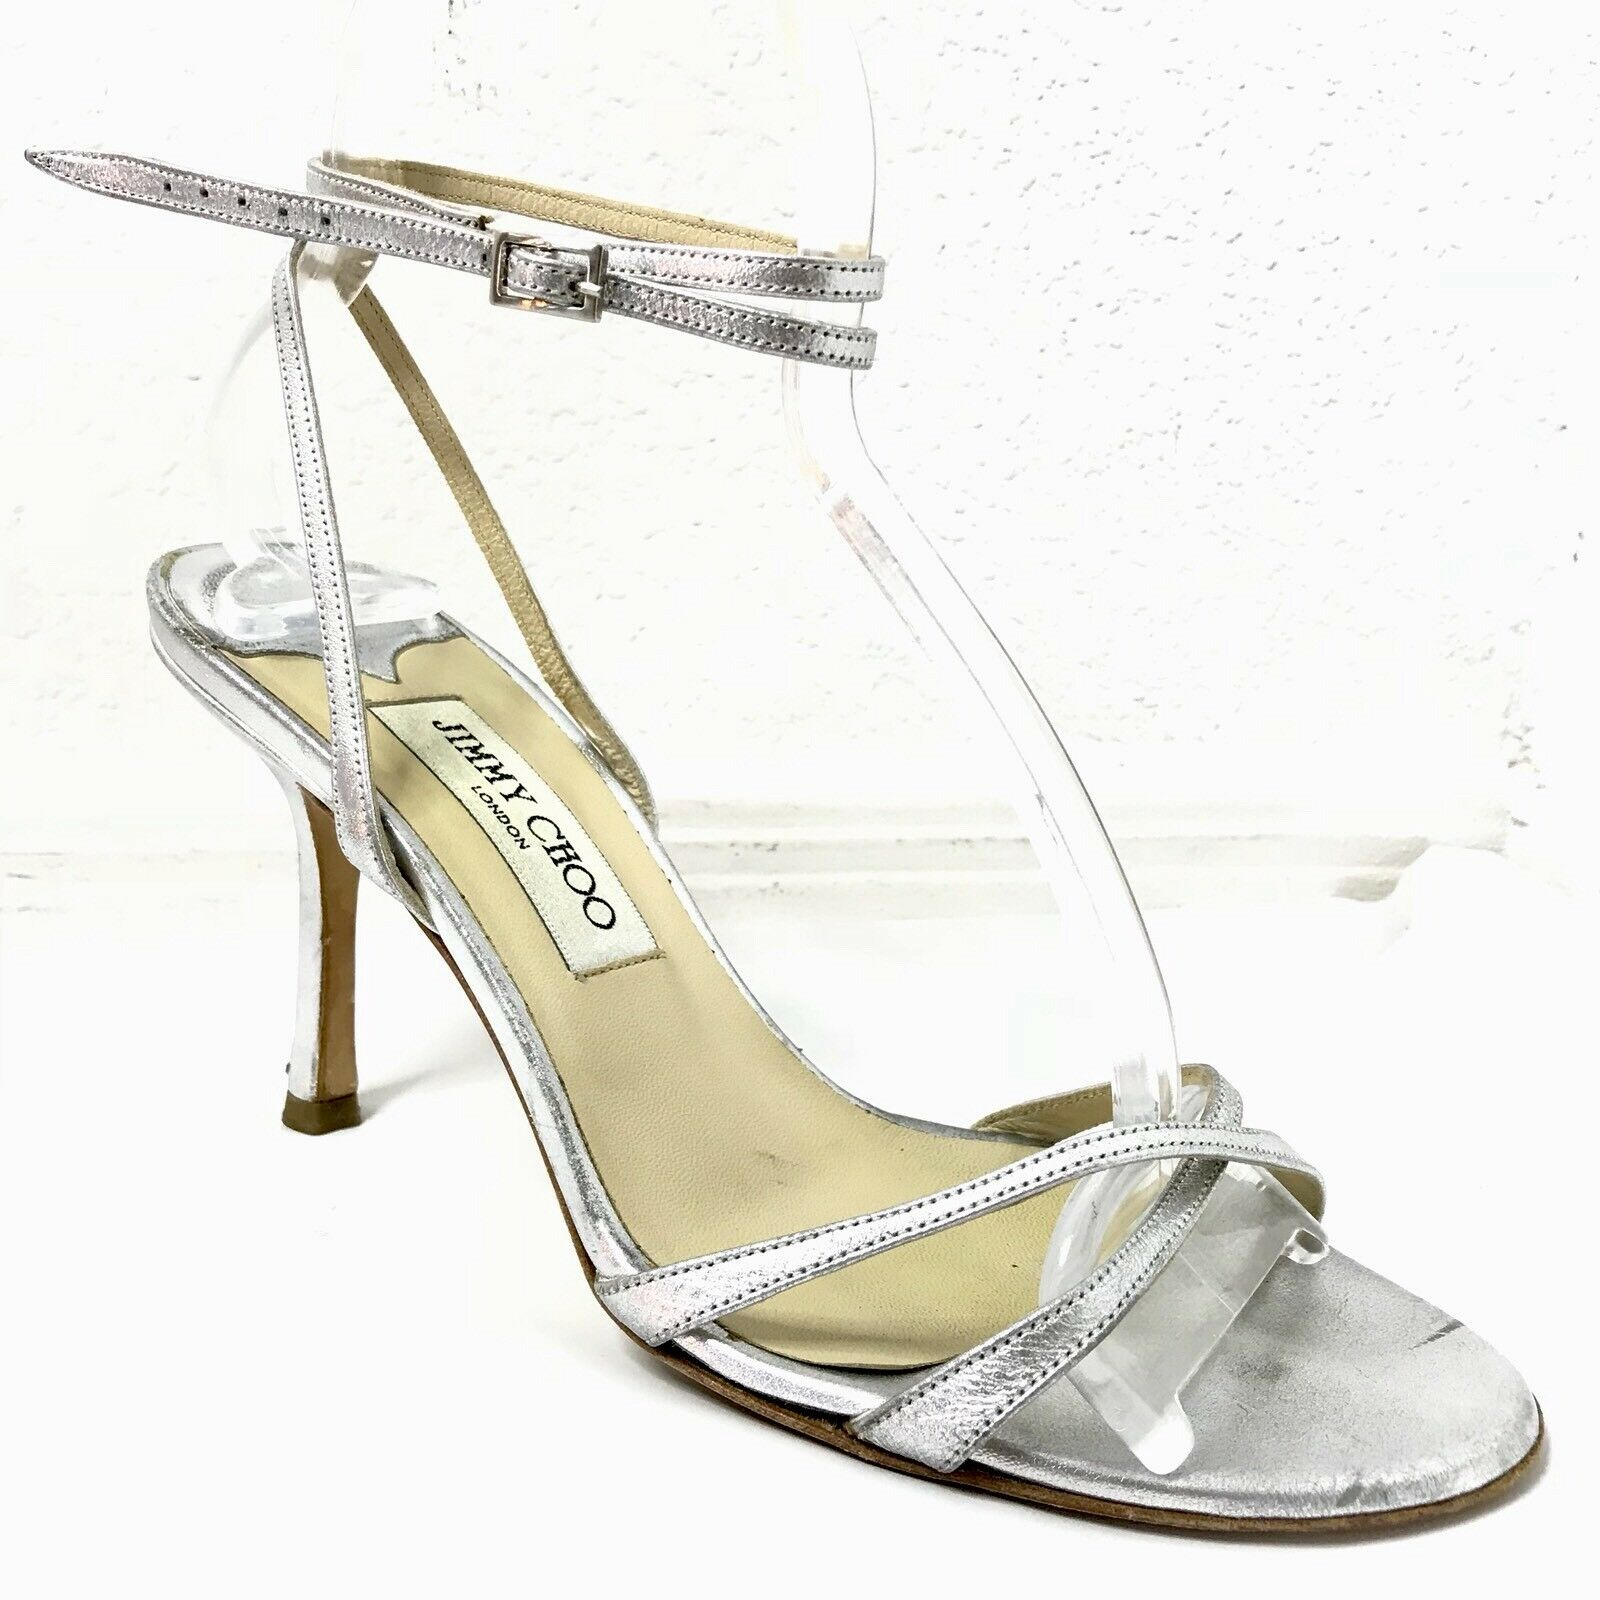 Jimmy Choo Tacones Sandalias para mujer mujer mujer de plata 38.5 8.5  ordenar ahora